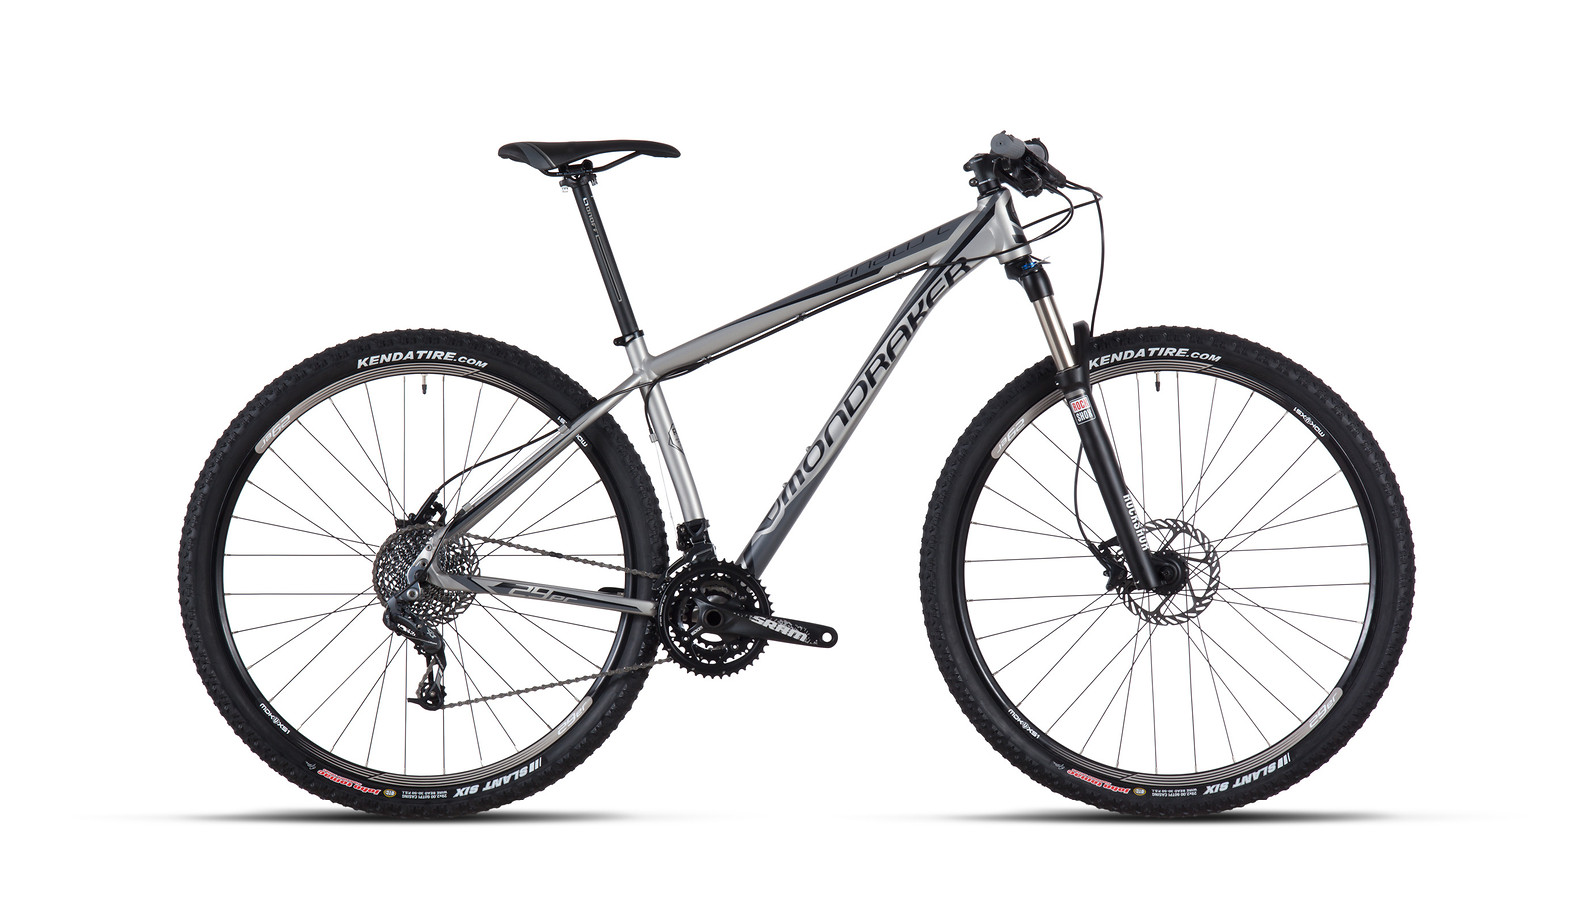 2013 Mondraker Finalist 29er Bike bike - mondraker finalist 29er